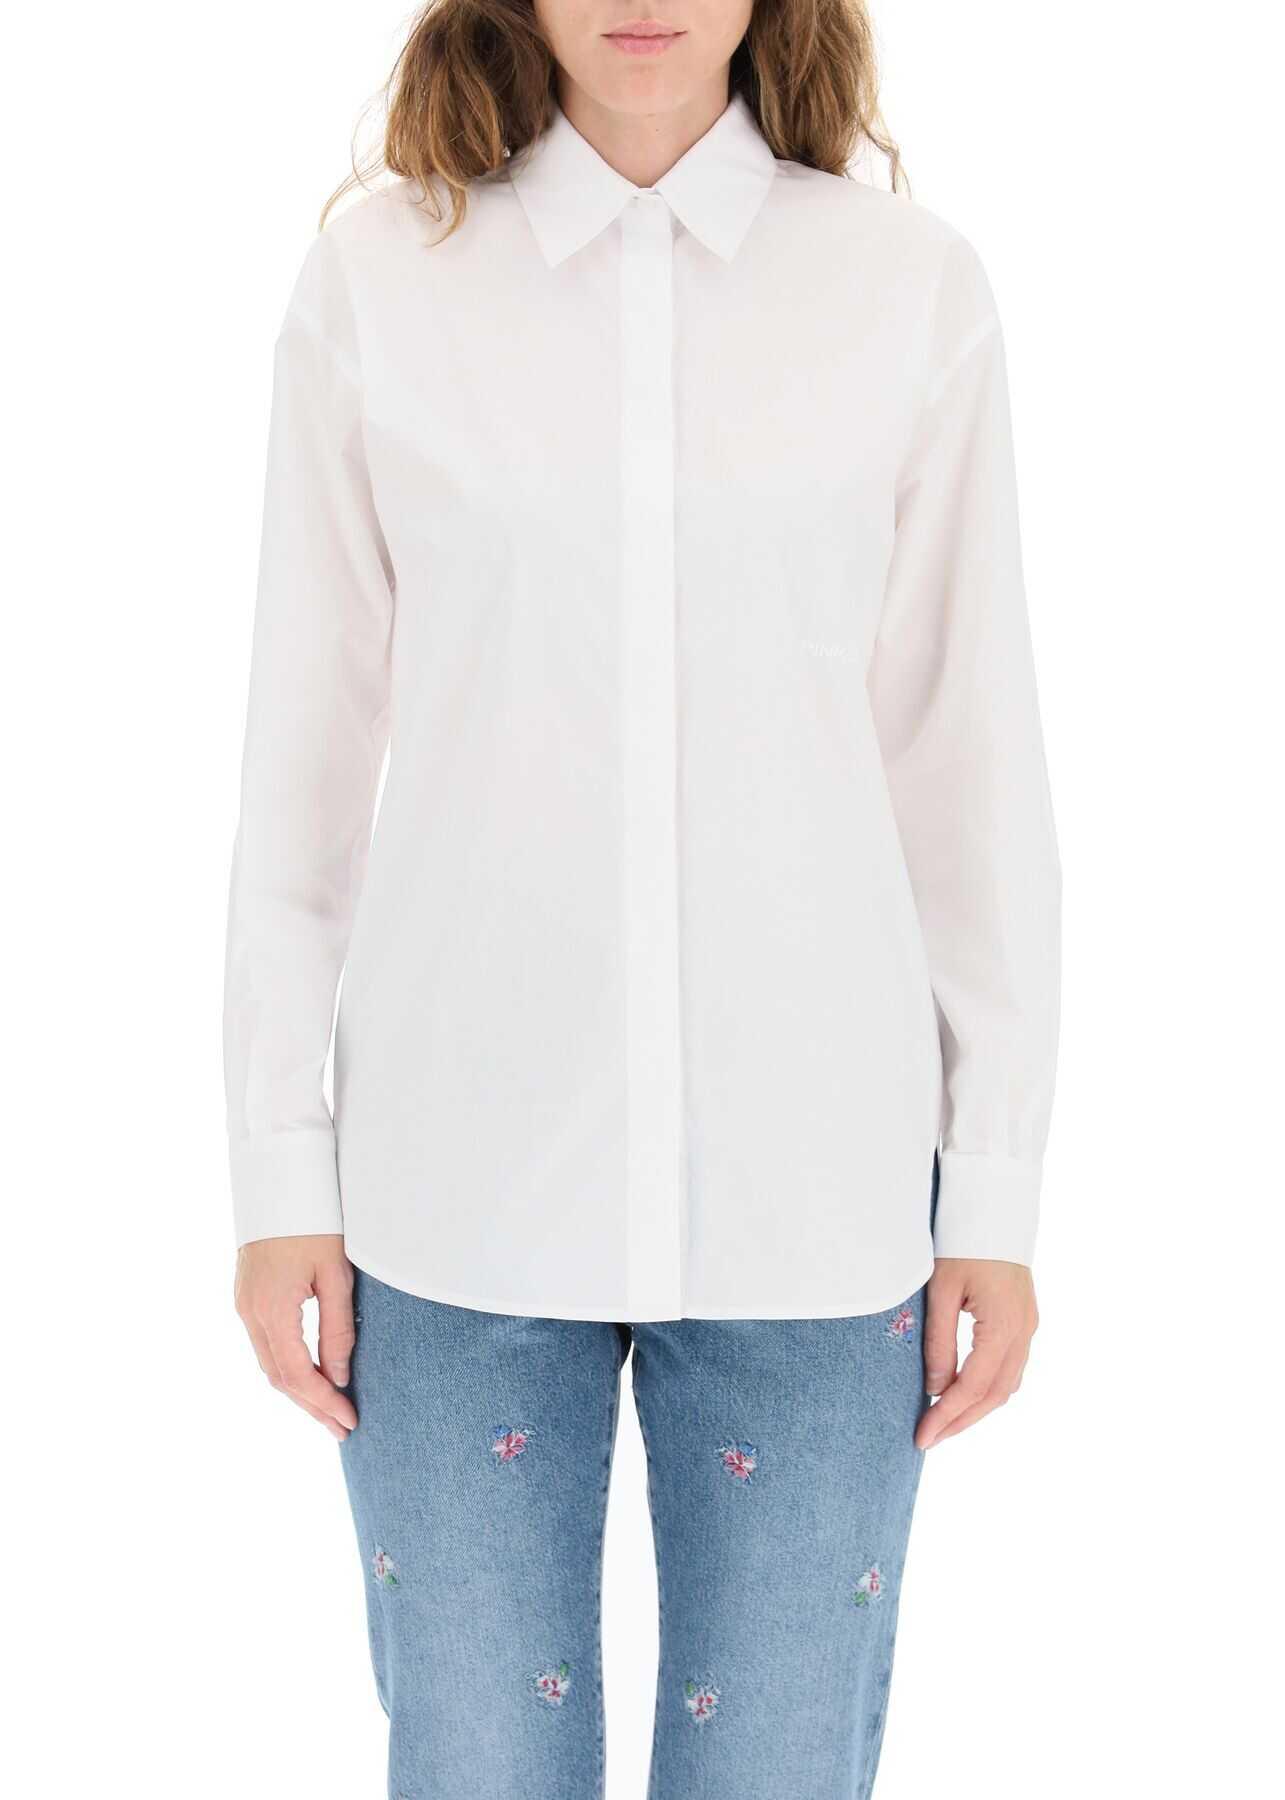 Pinko Bridport Poplin Shirt 1G16VK Y6VW BIANCO BRILL image0